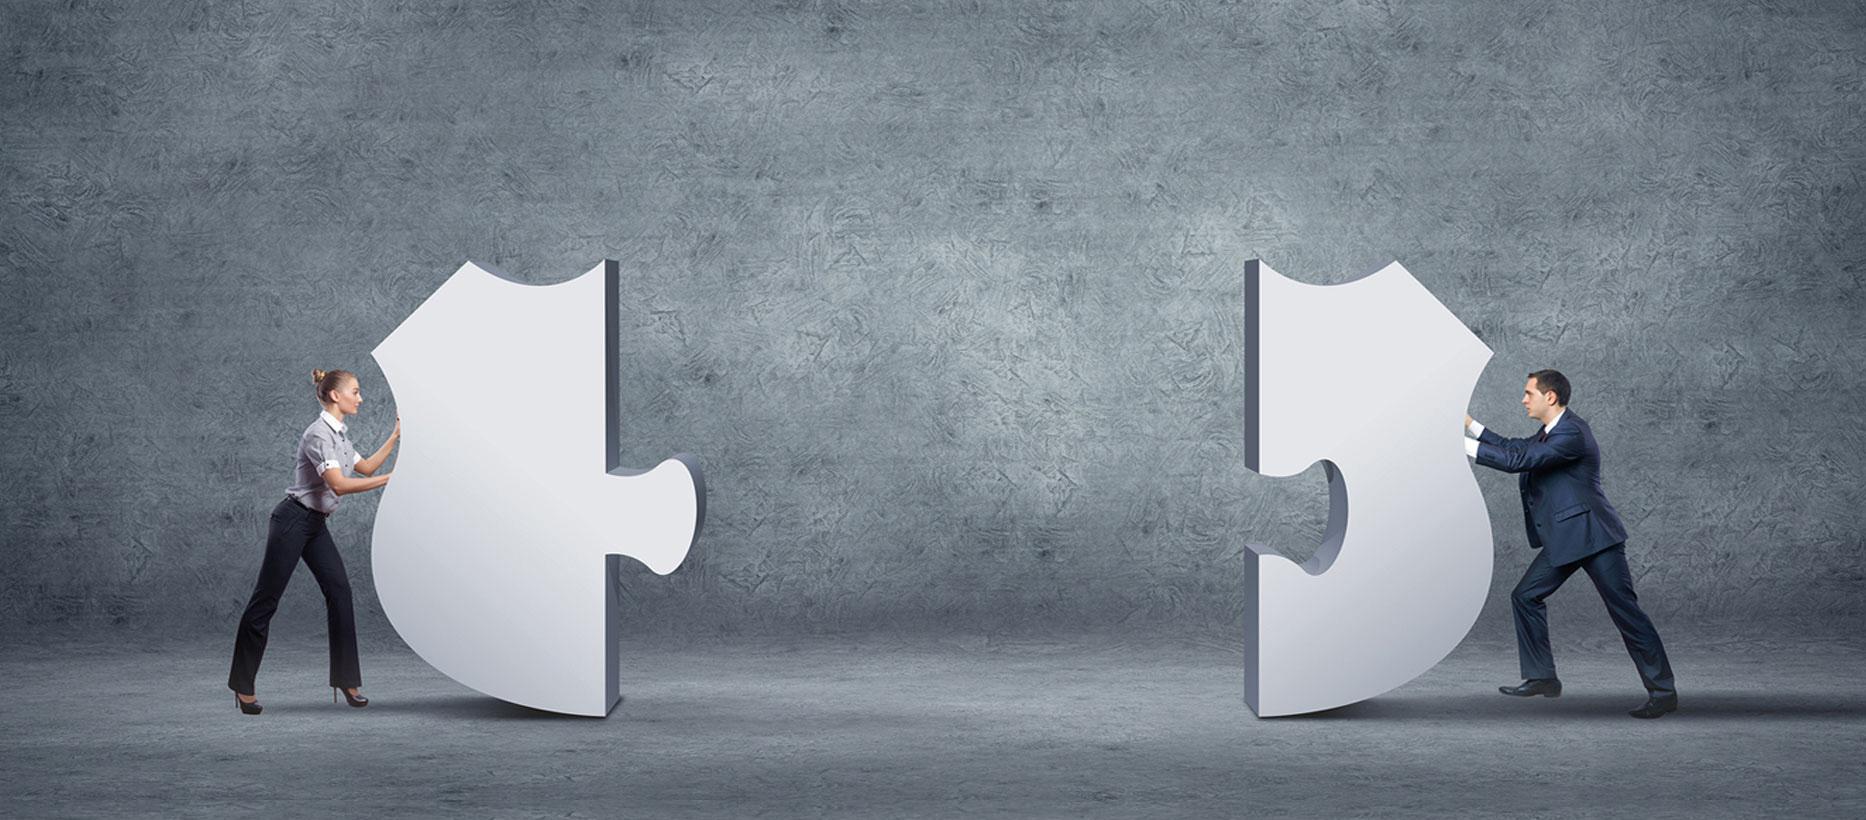 CONANIMA match & link